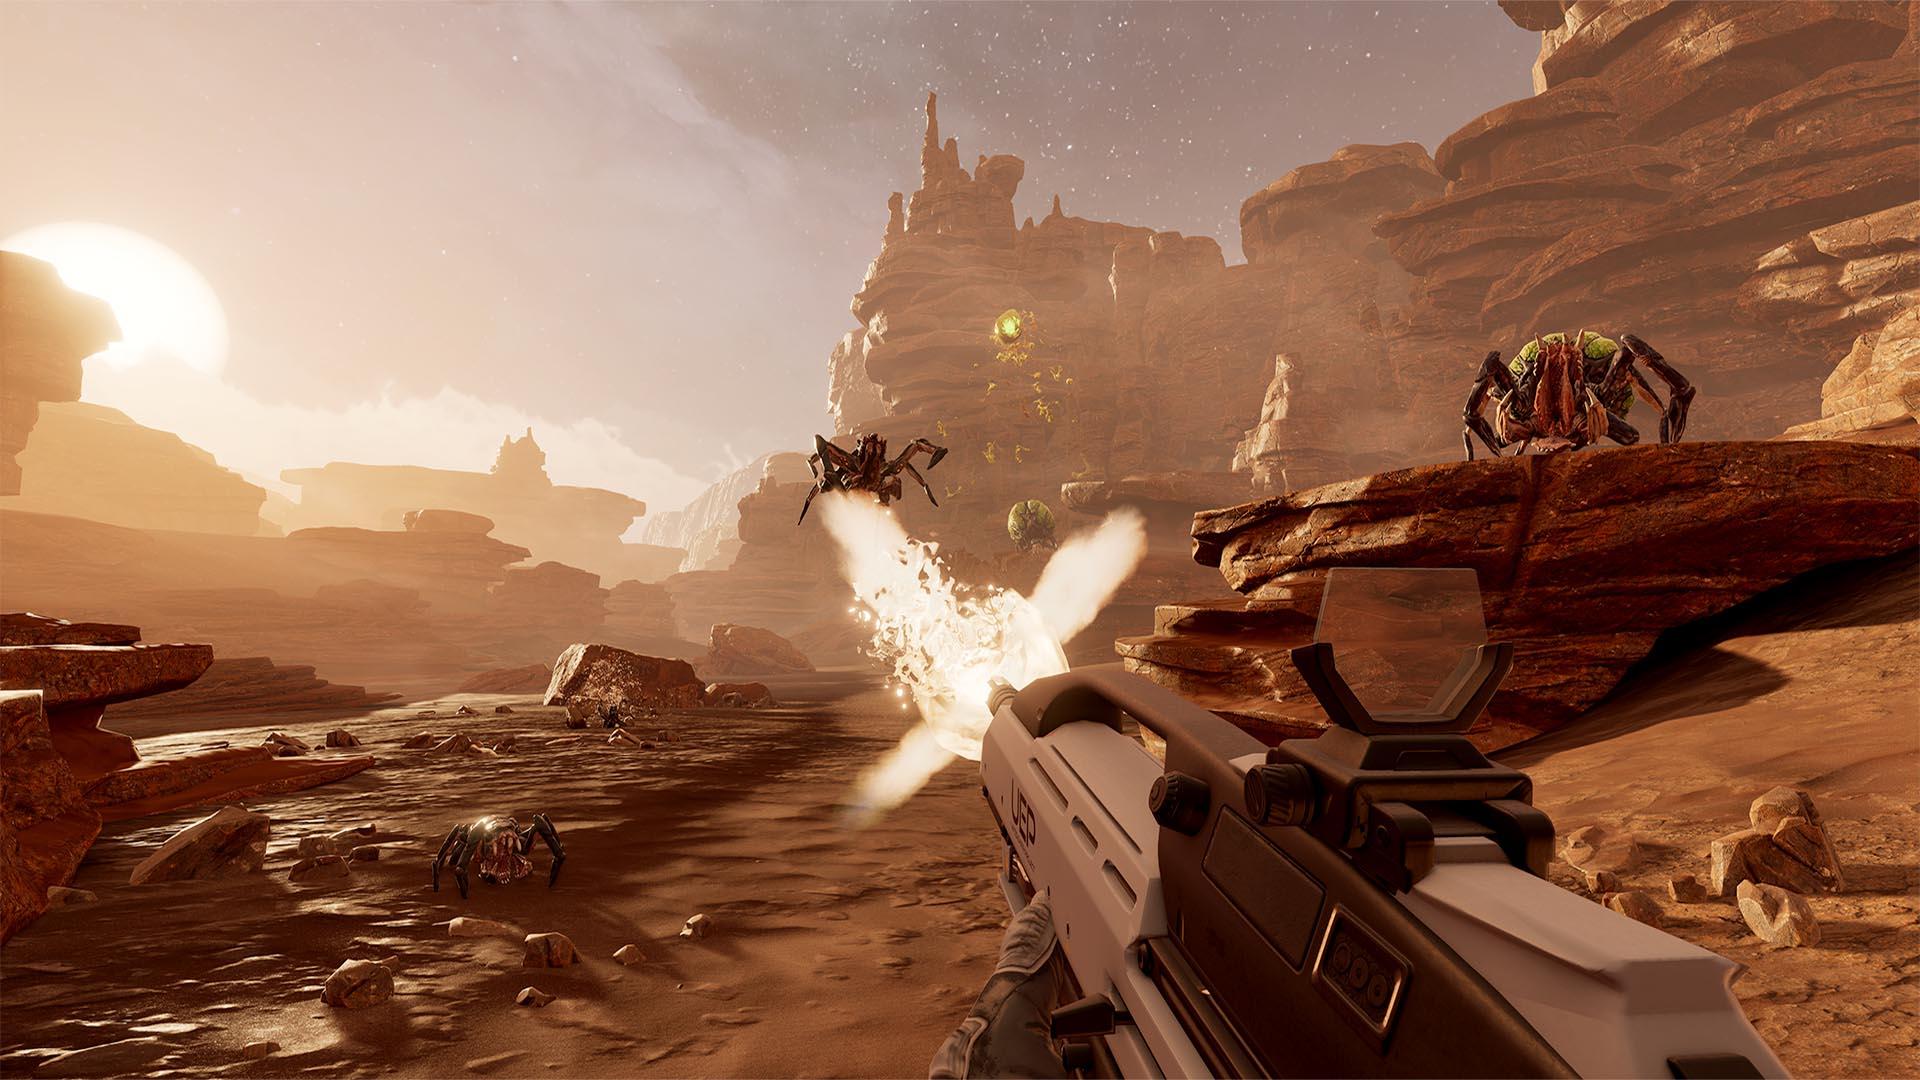 Компания Sony анонсировала игру Farpoint и VR-контроллер